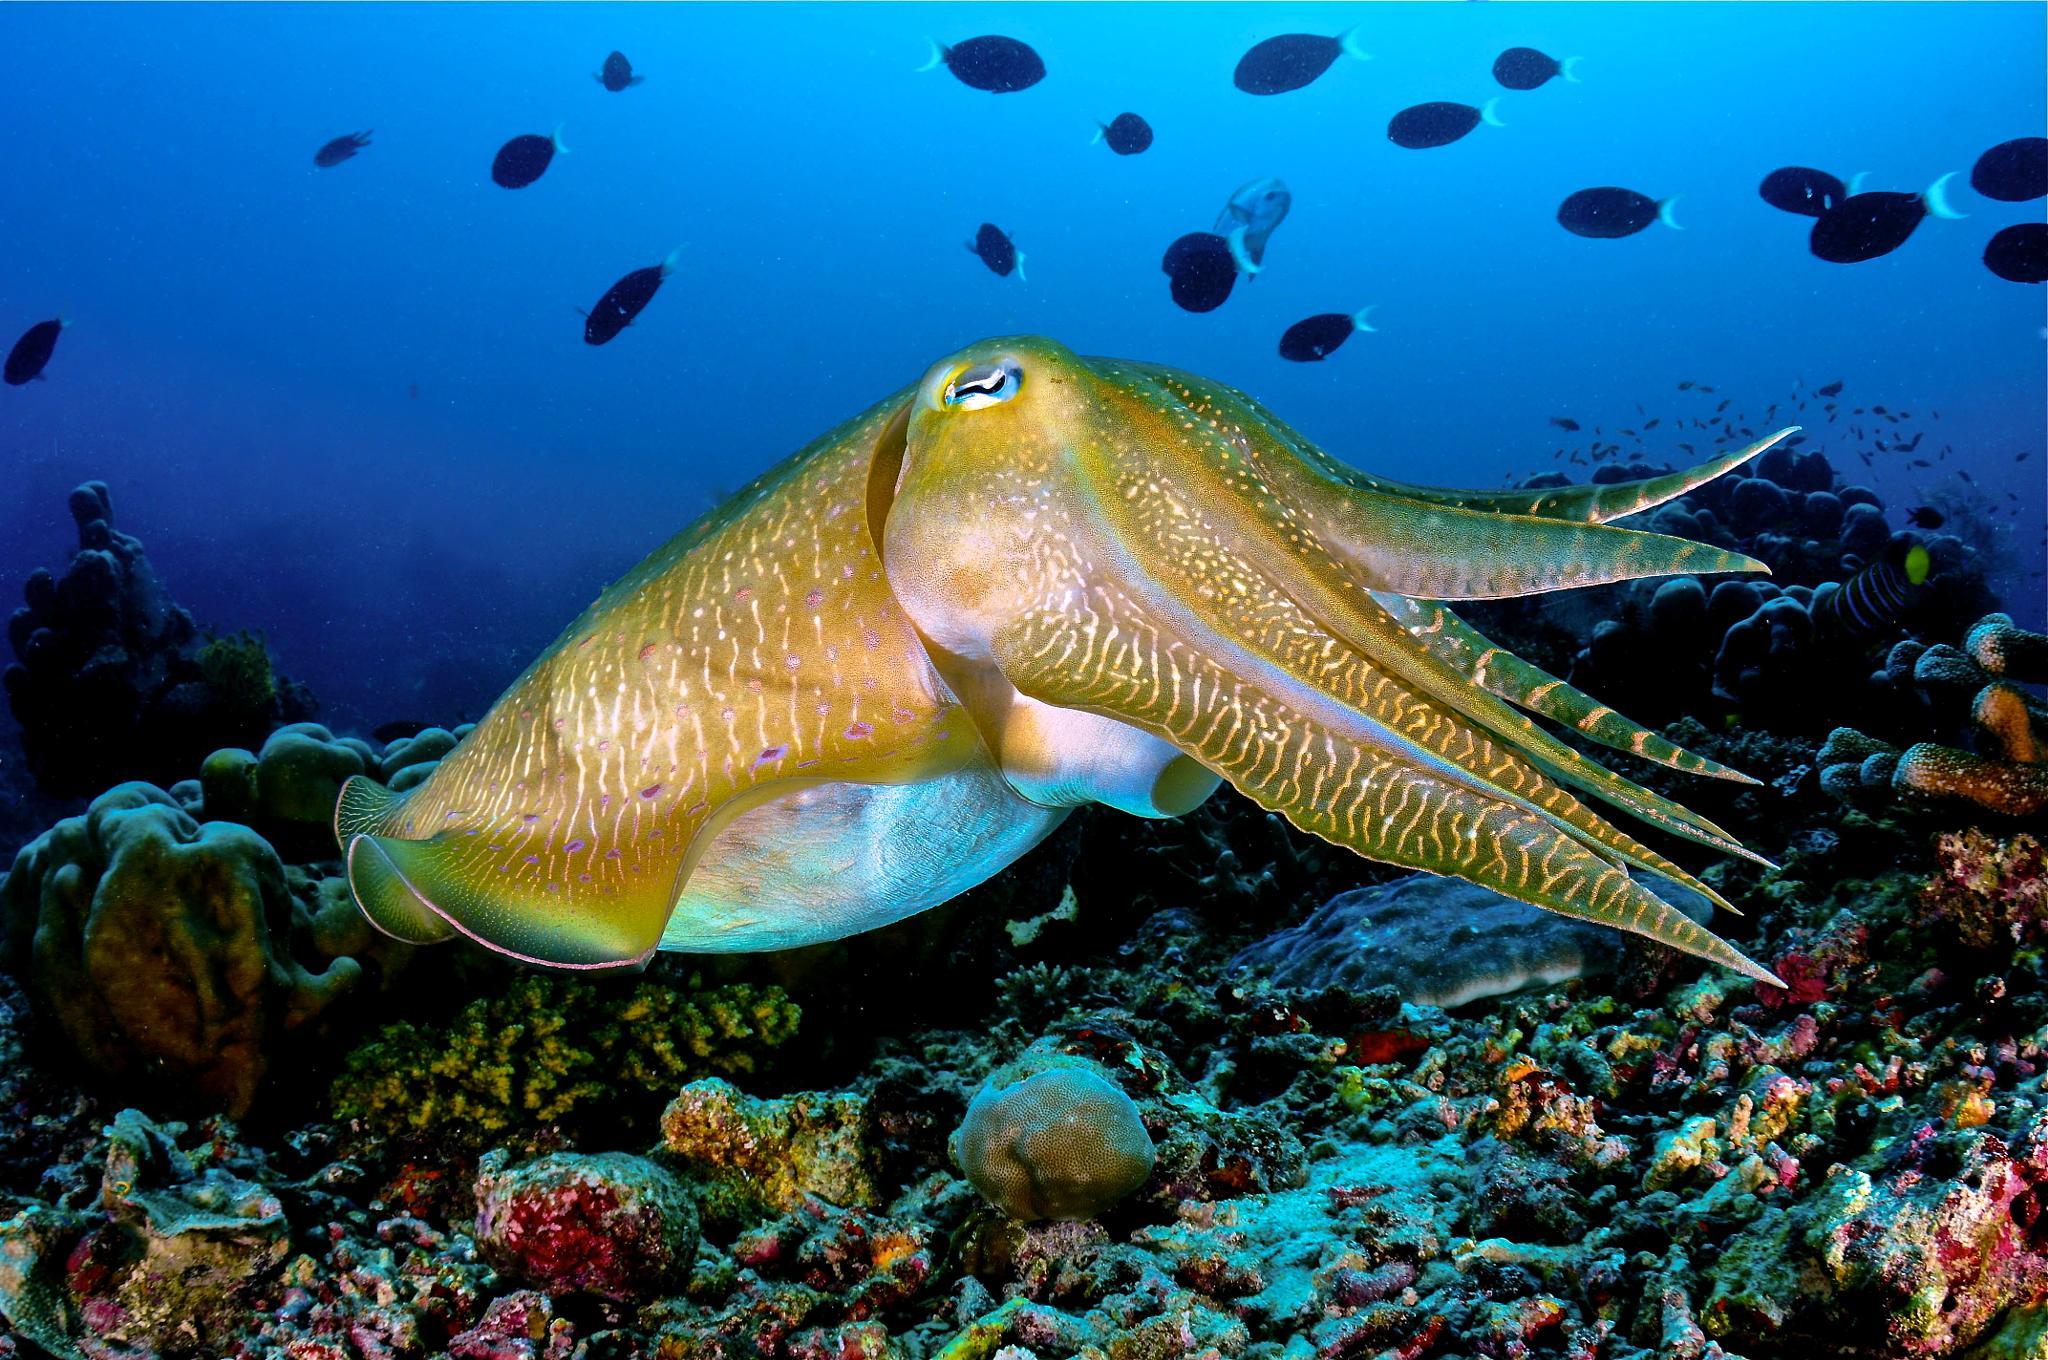 Cuttle fish.  Sipadan Island, Sabah, Malaysia by fjlian